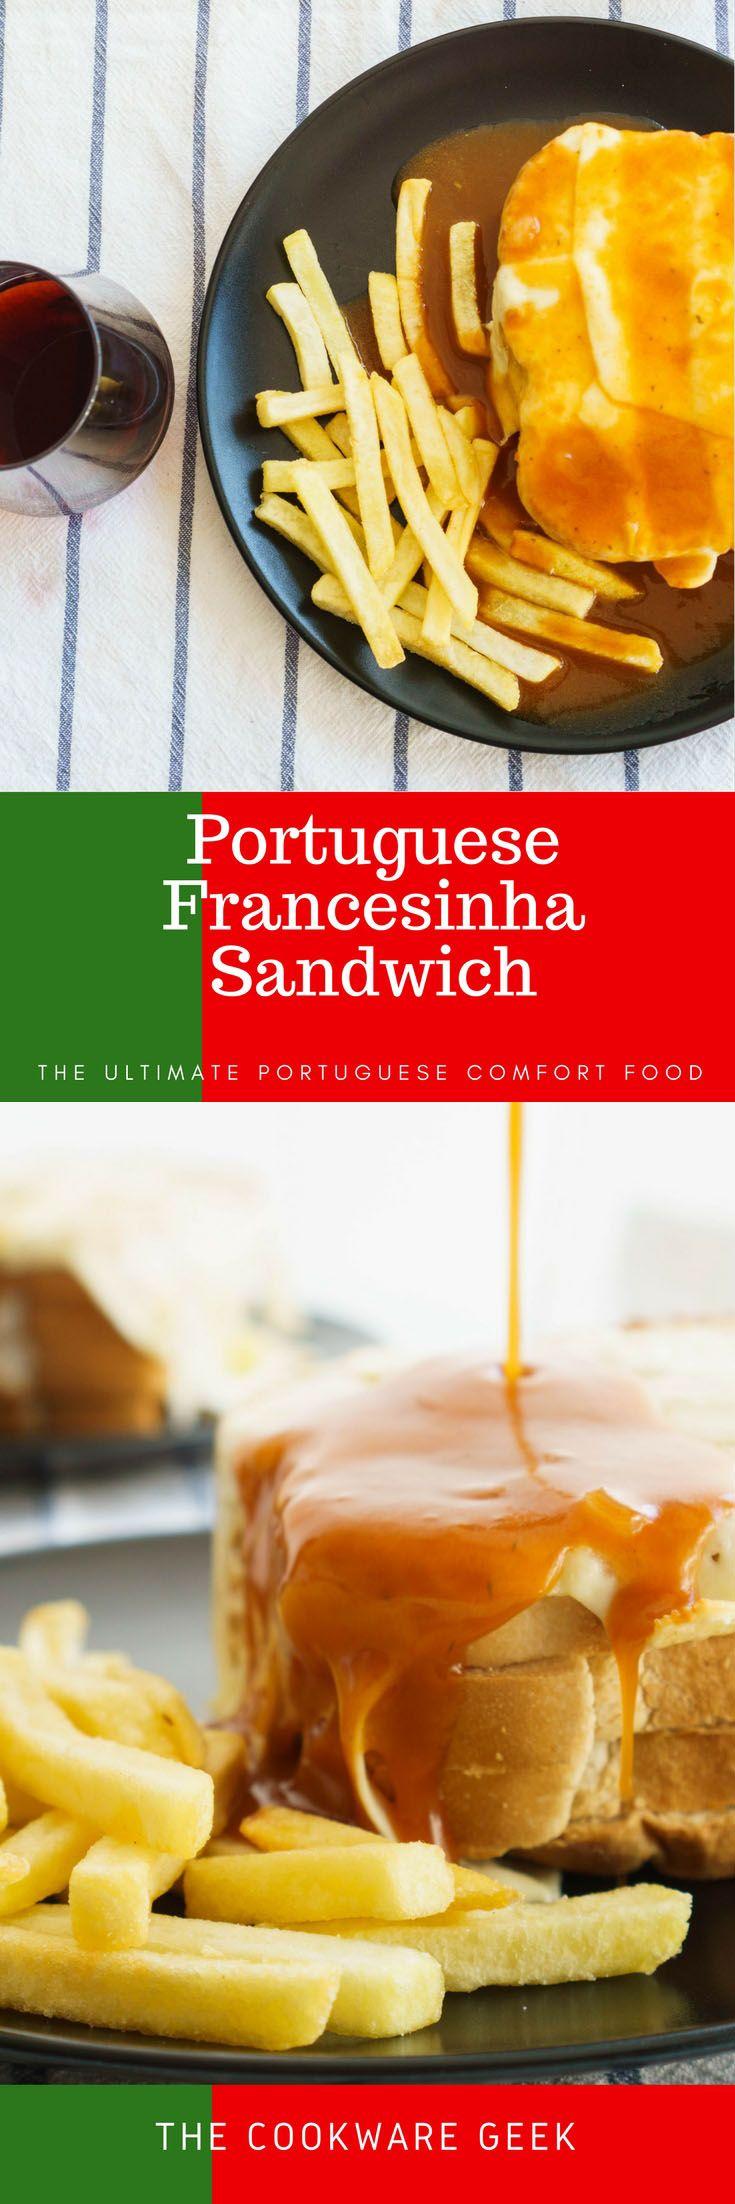 Portuguese Francesinha Sandwich | The Cookware Geek